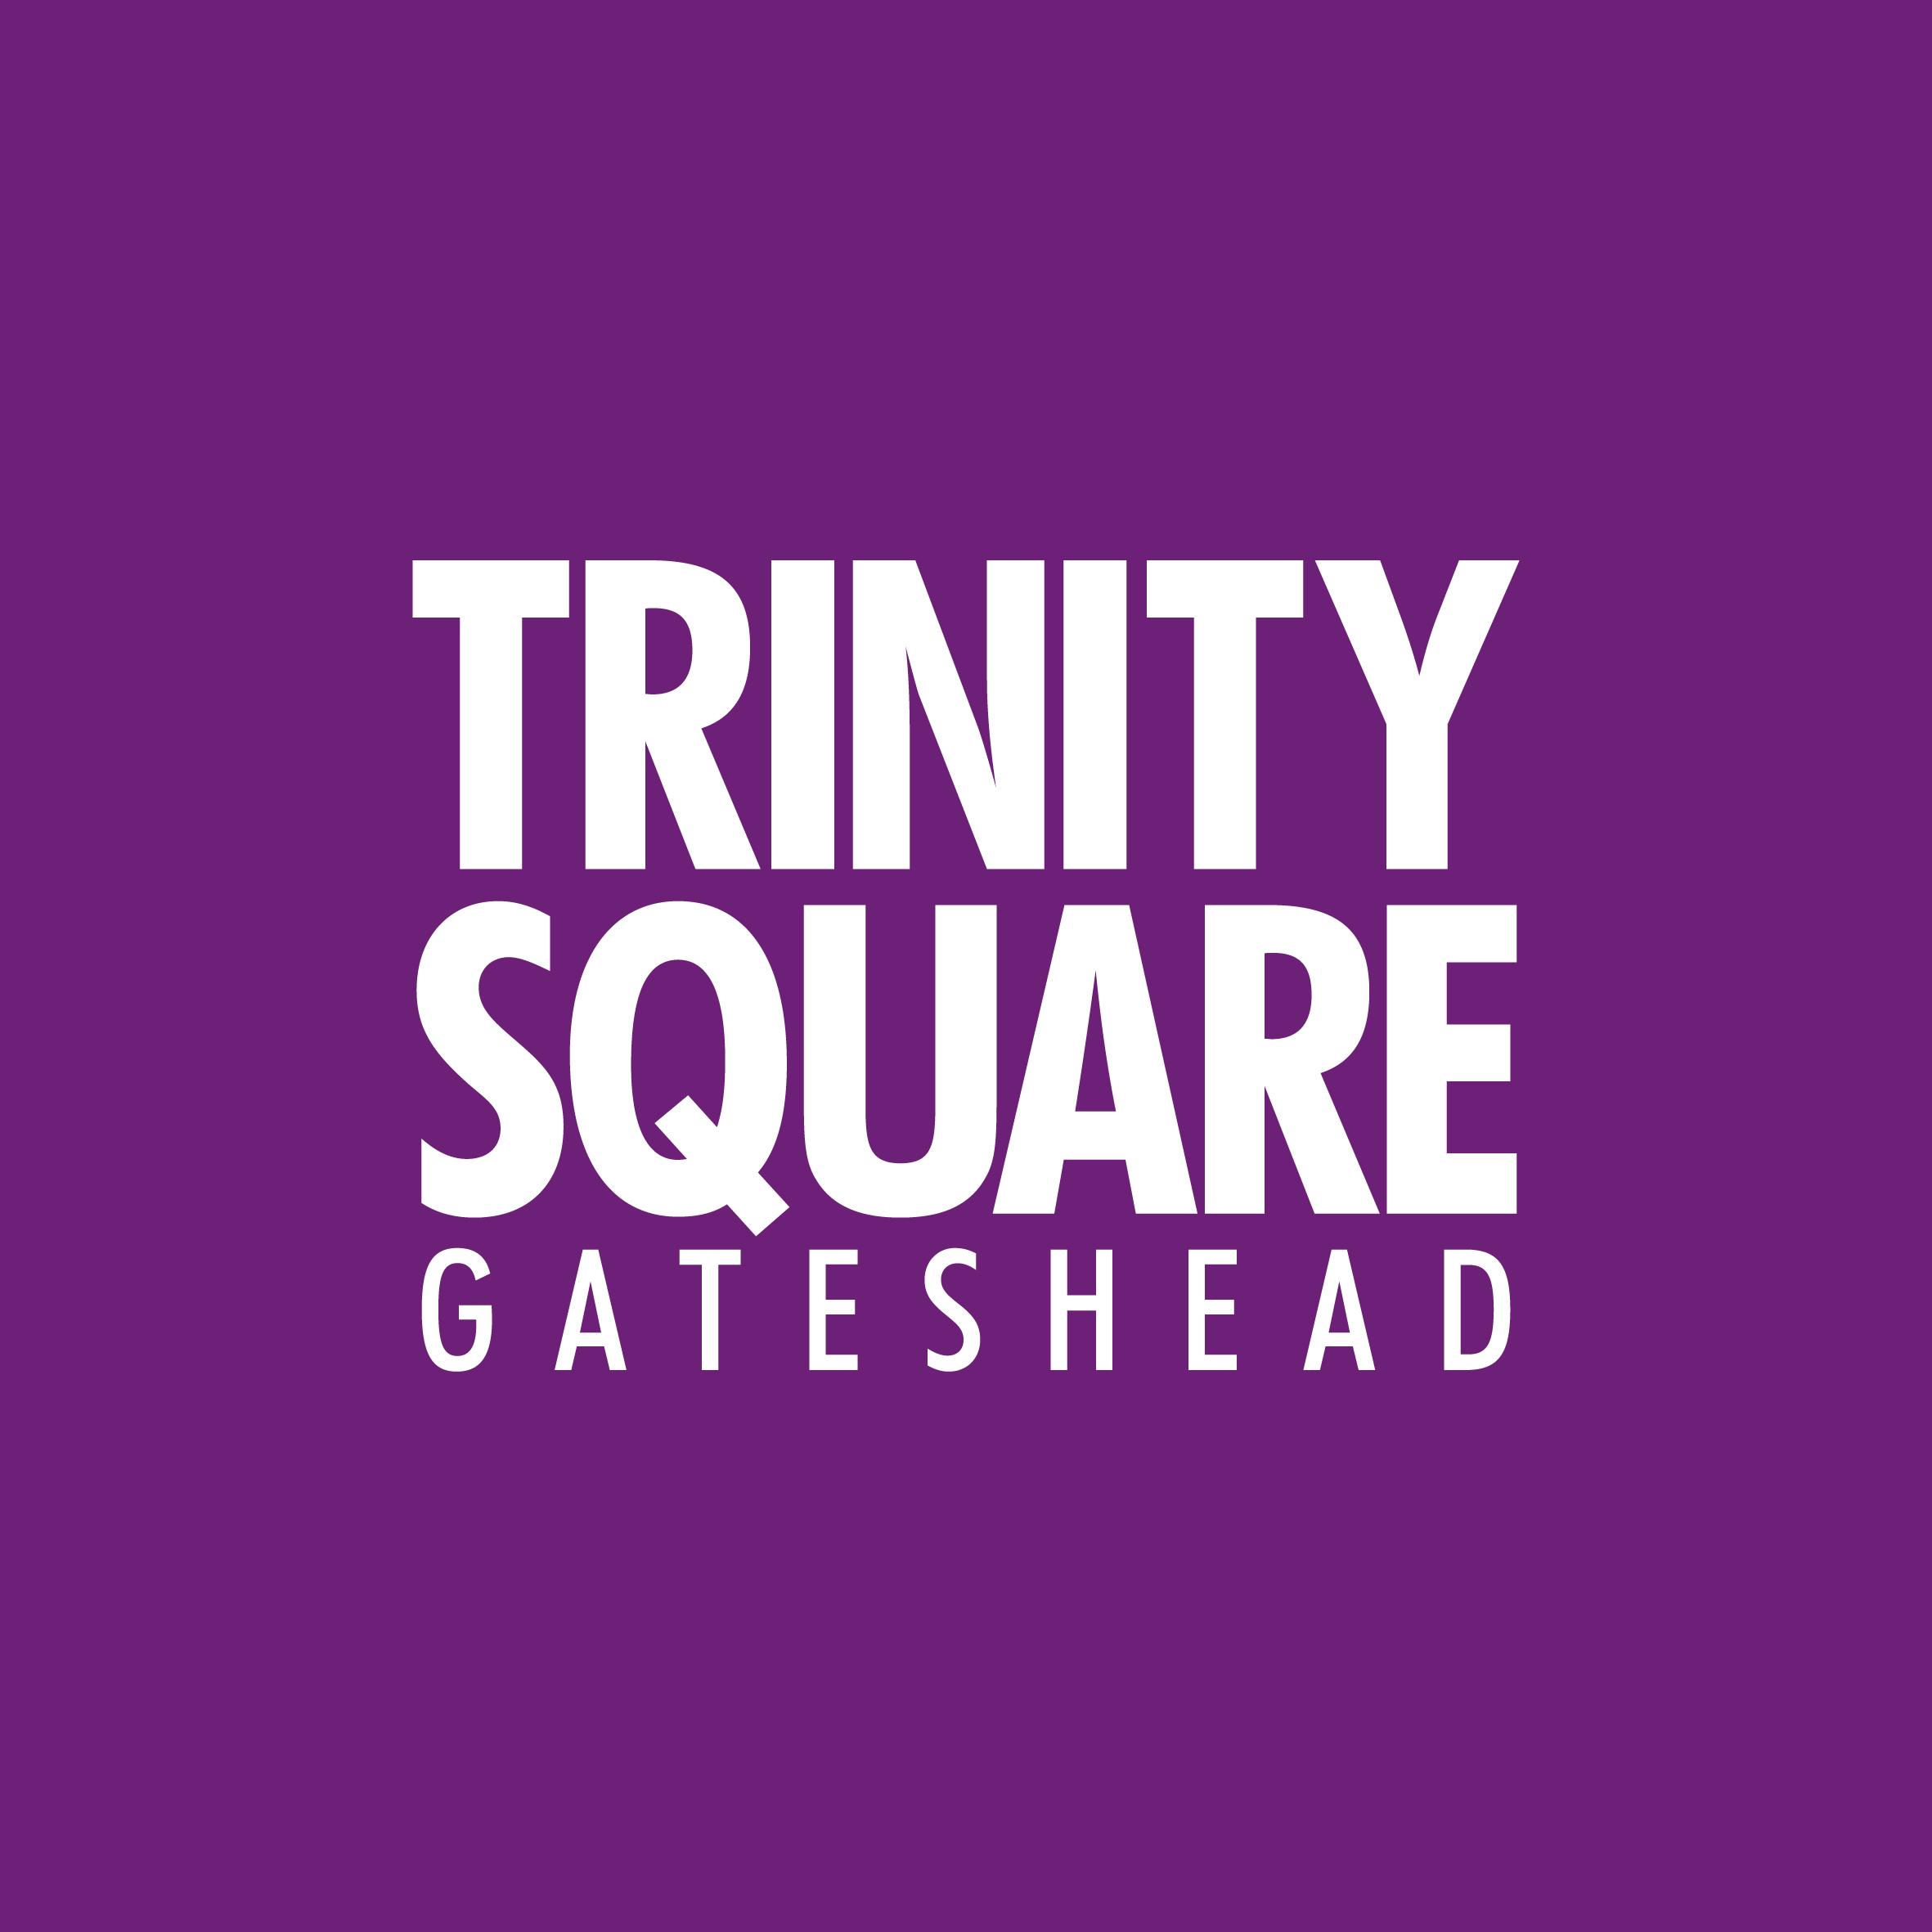 Trinity Square Gateshead